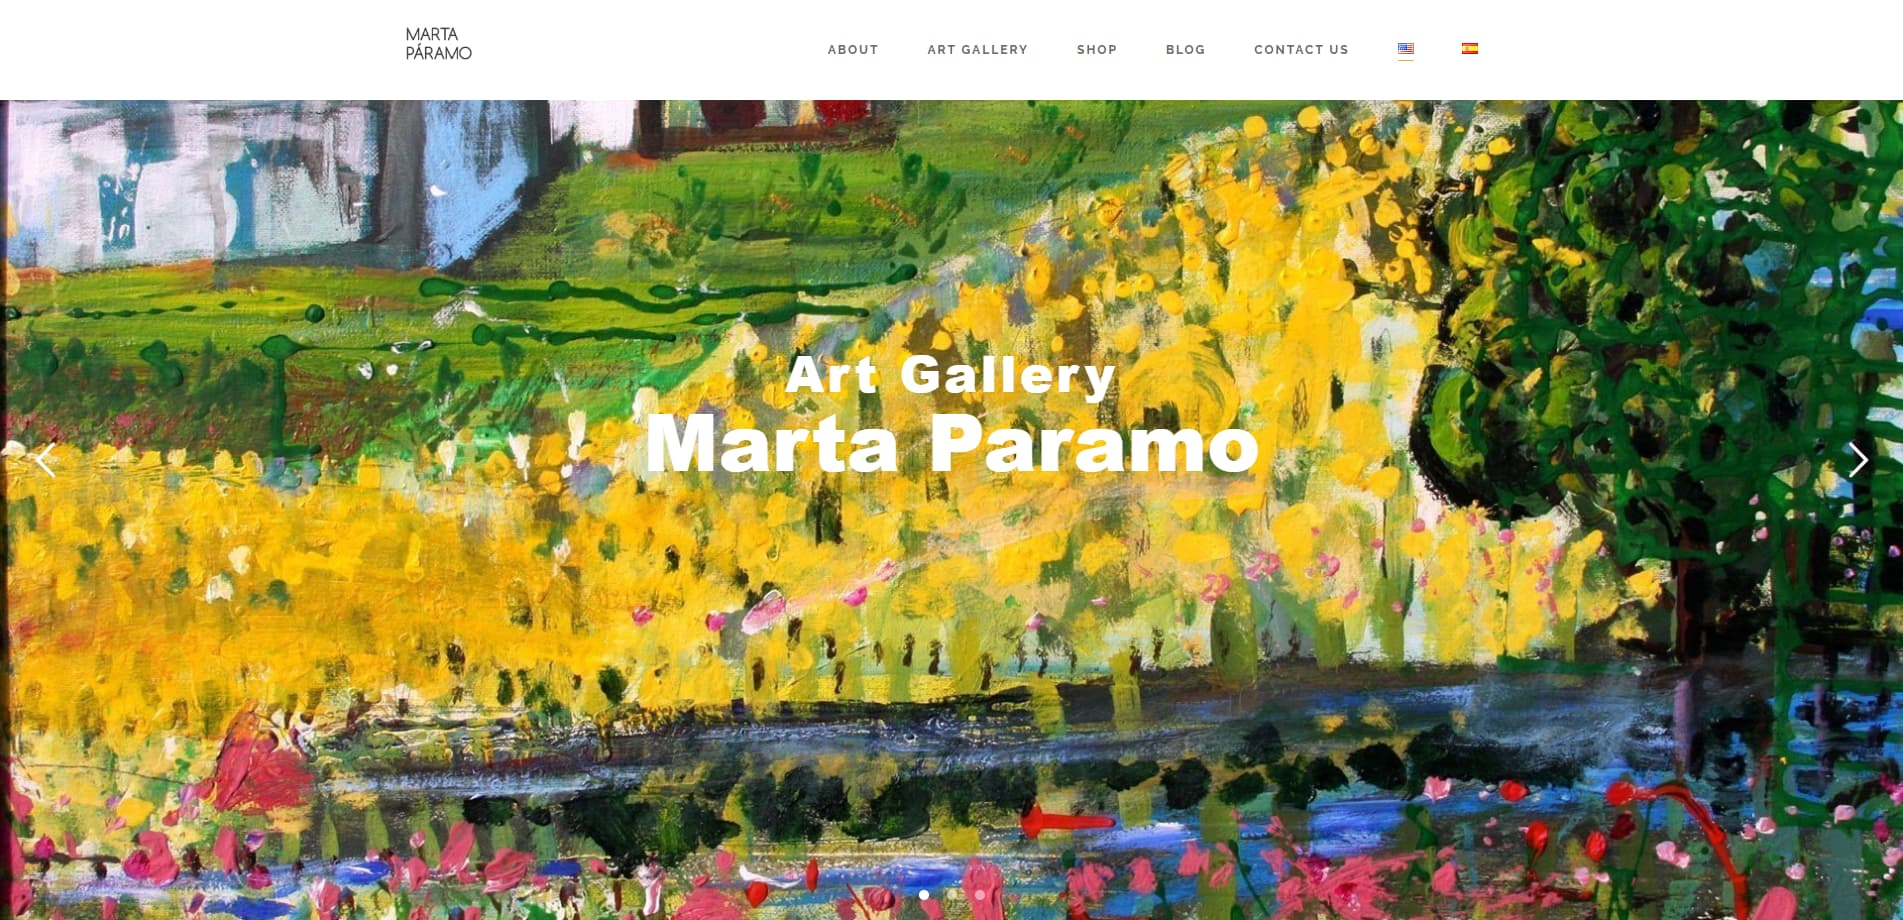 Martaparamo Art Gallery